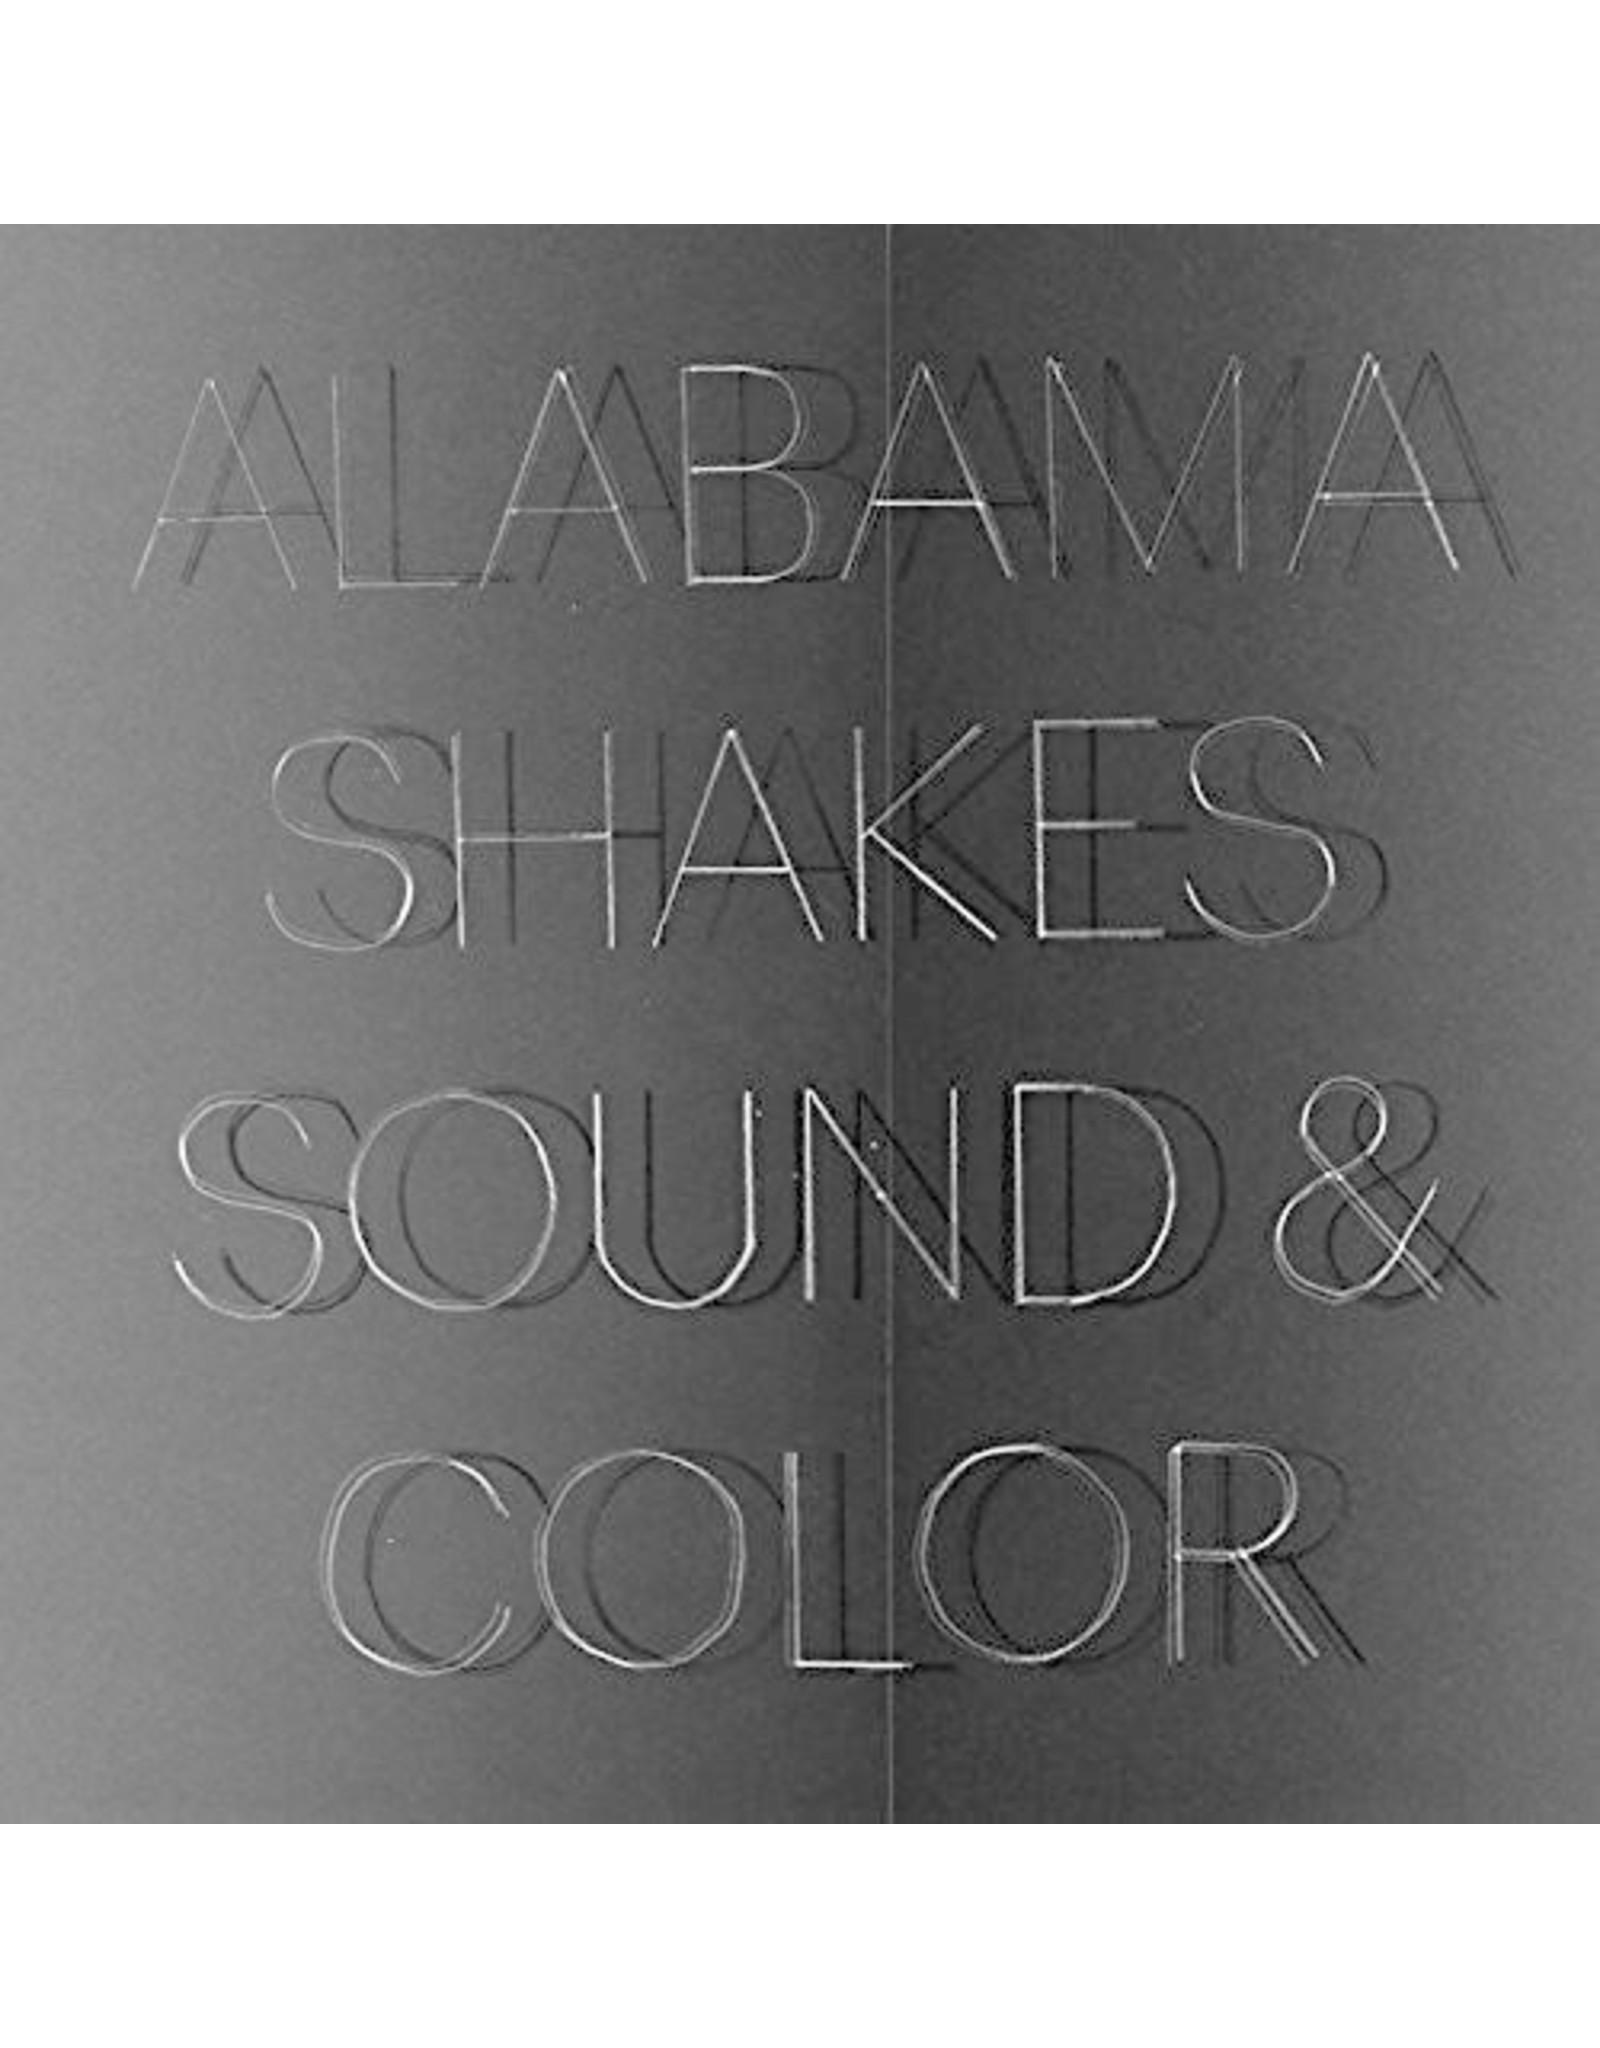 New Vinyl Alabama Shakes - Sound & Color (Clear) 2LP